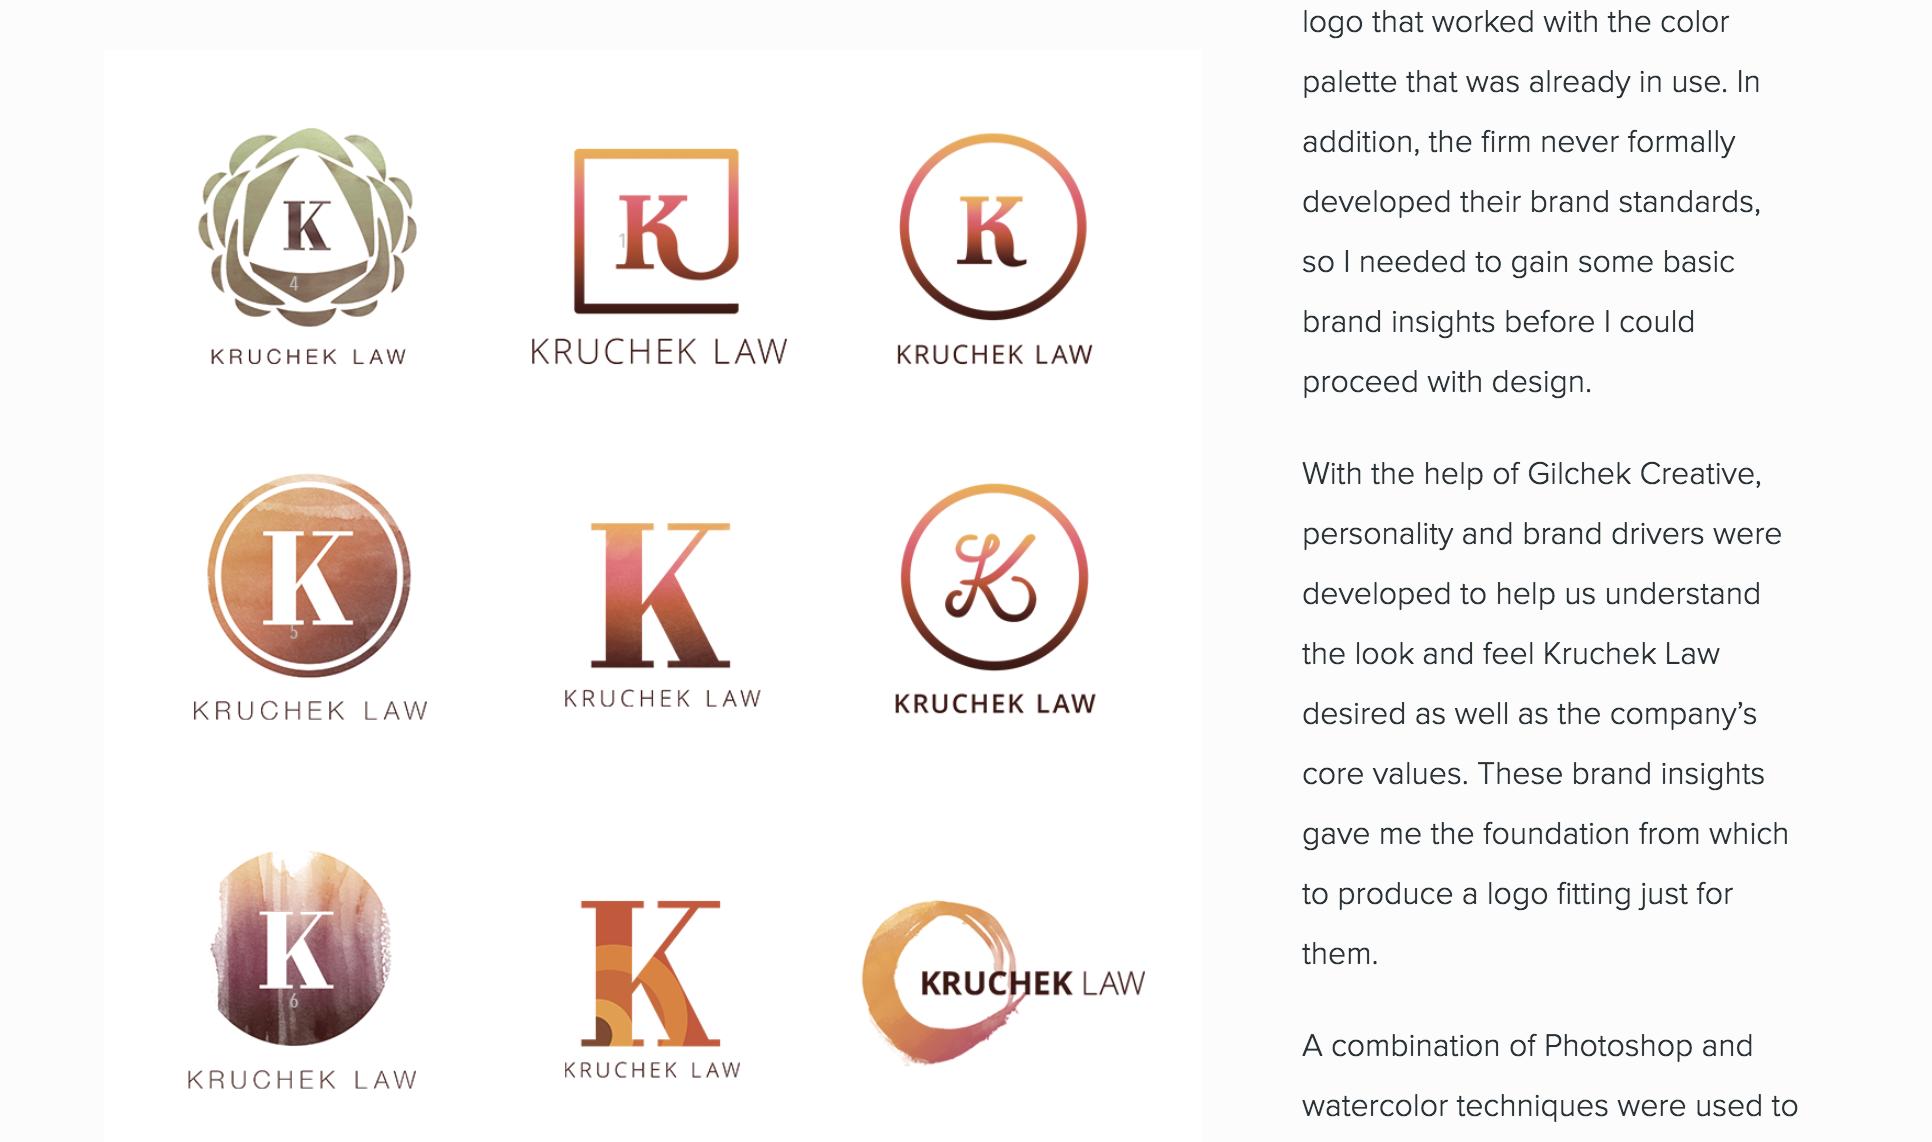 Bloom Design & Illustration portfolio sample - Kruchek Law logo concepting